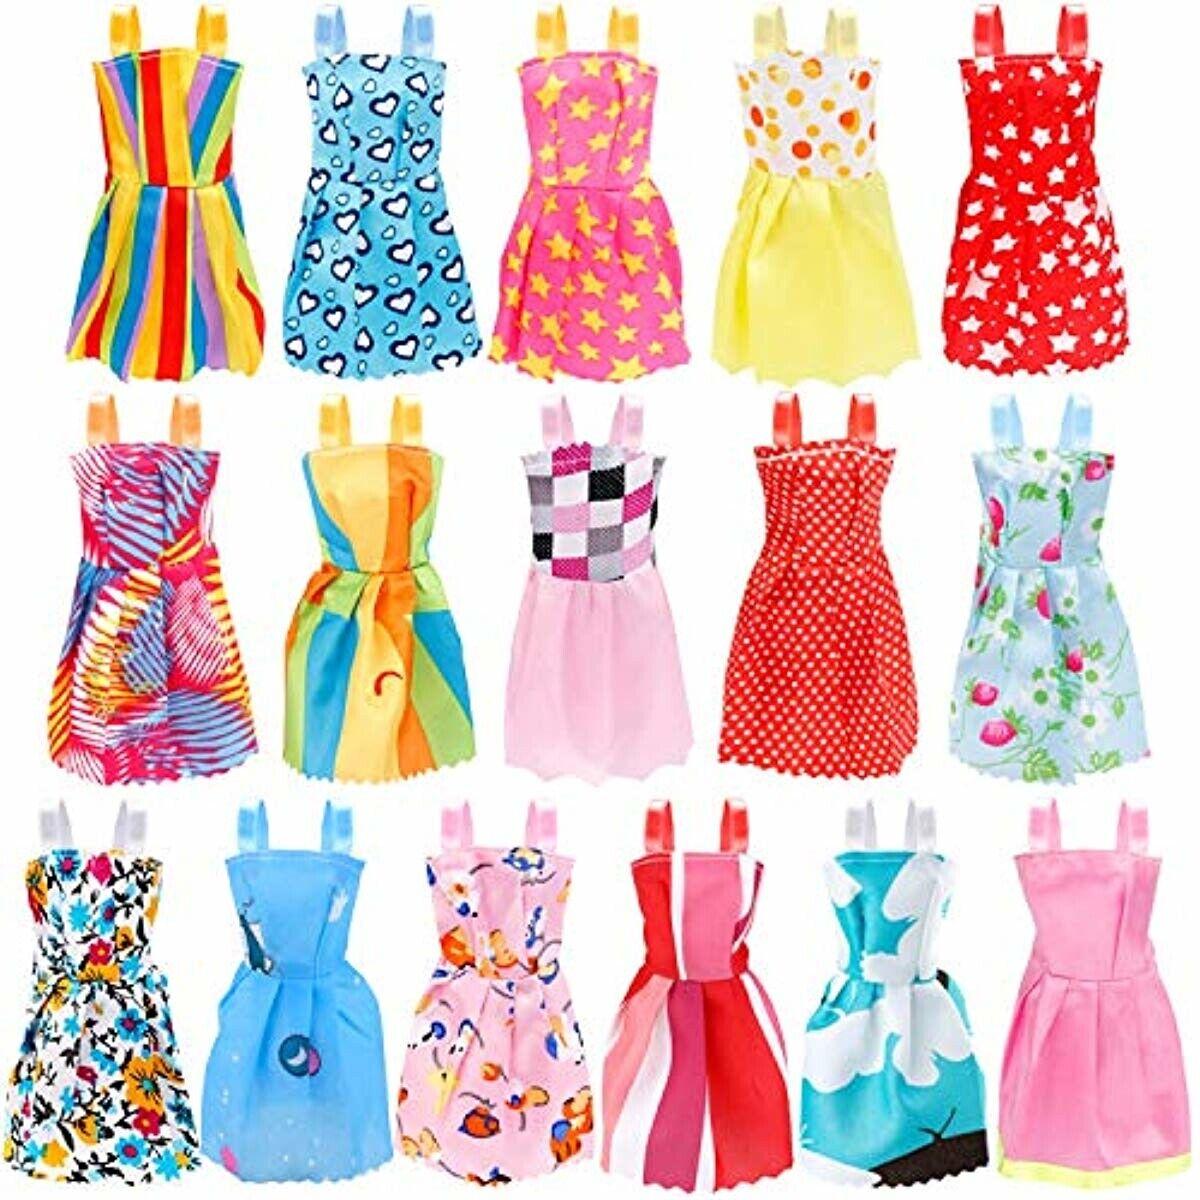 73PCS Barbie Doll Clothes Party Gown Shoes Bag Necklace Hanger Doll Accessories 2